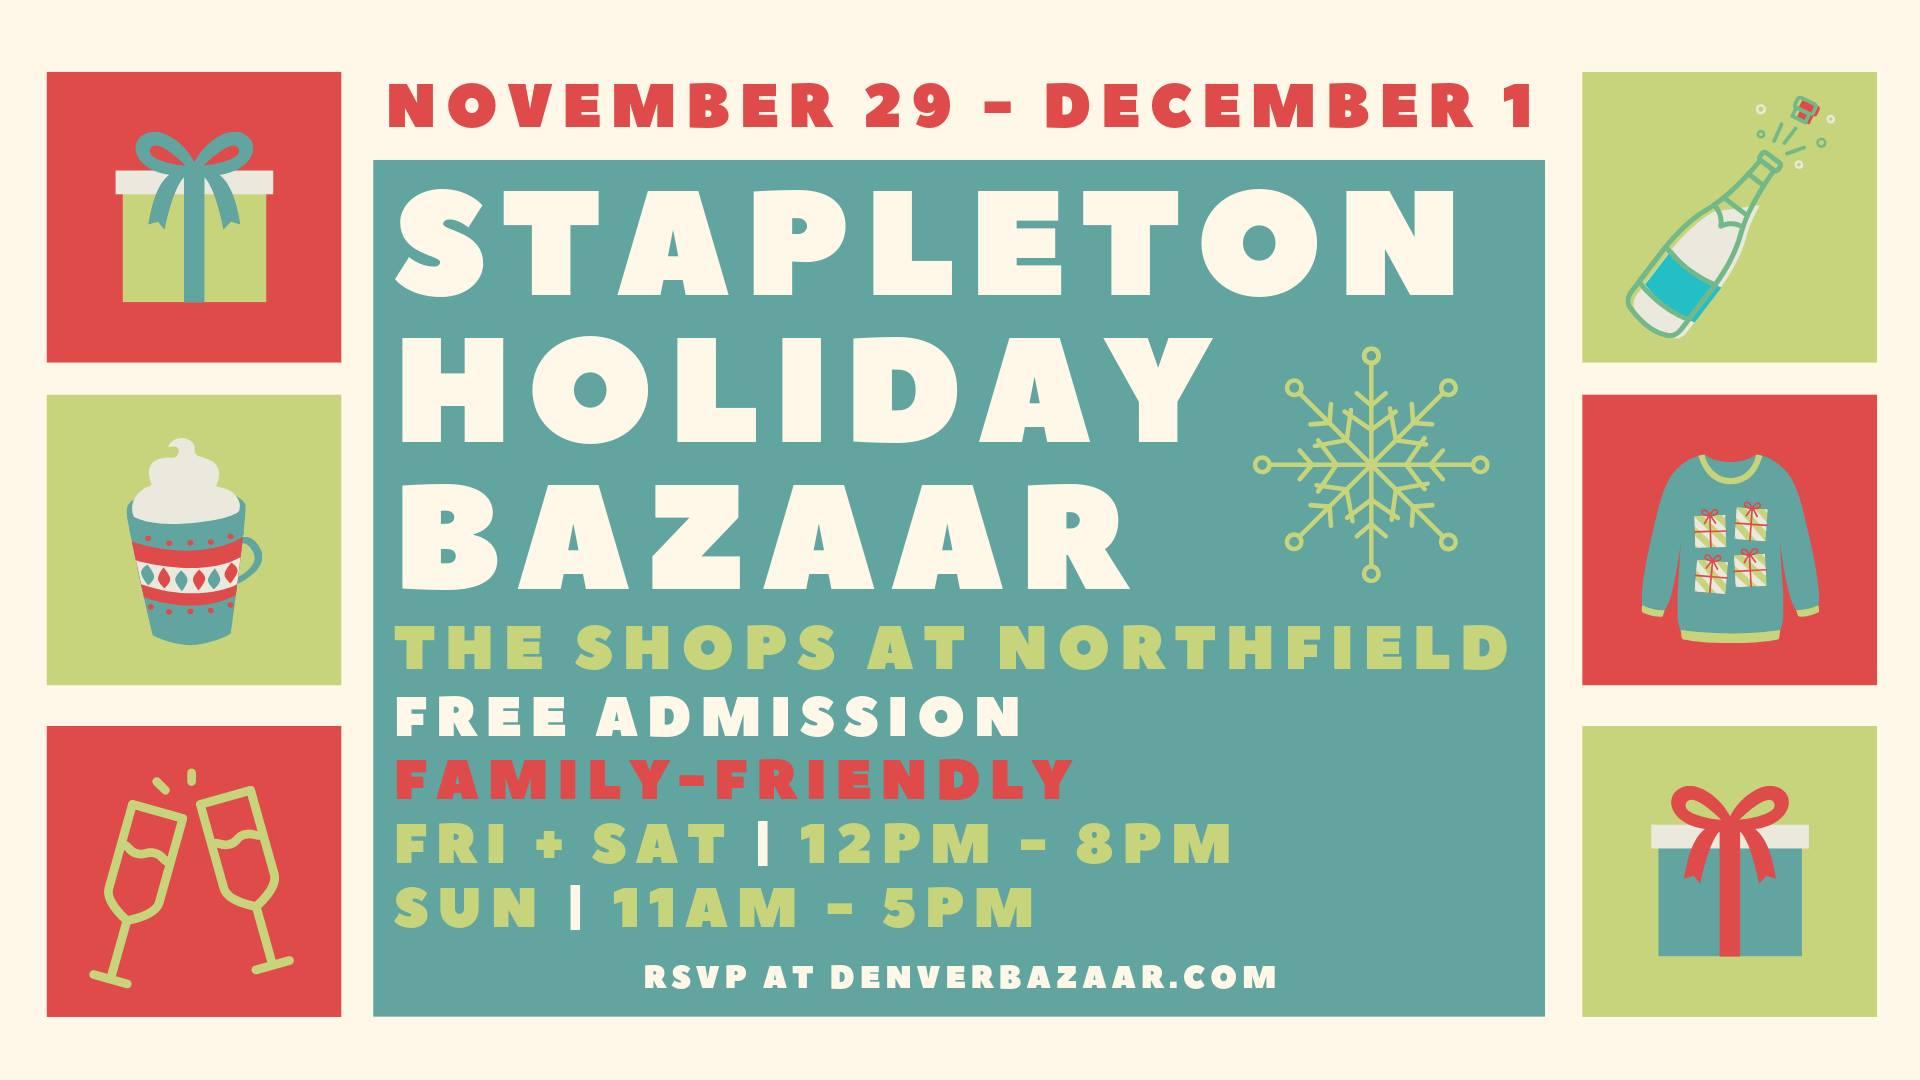 Stapleton Holiday BAZAAR Friday cover photo 2